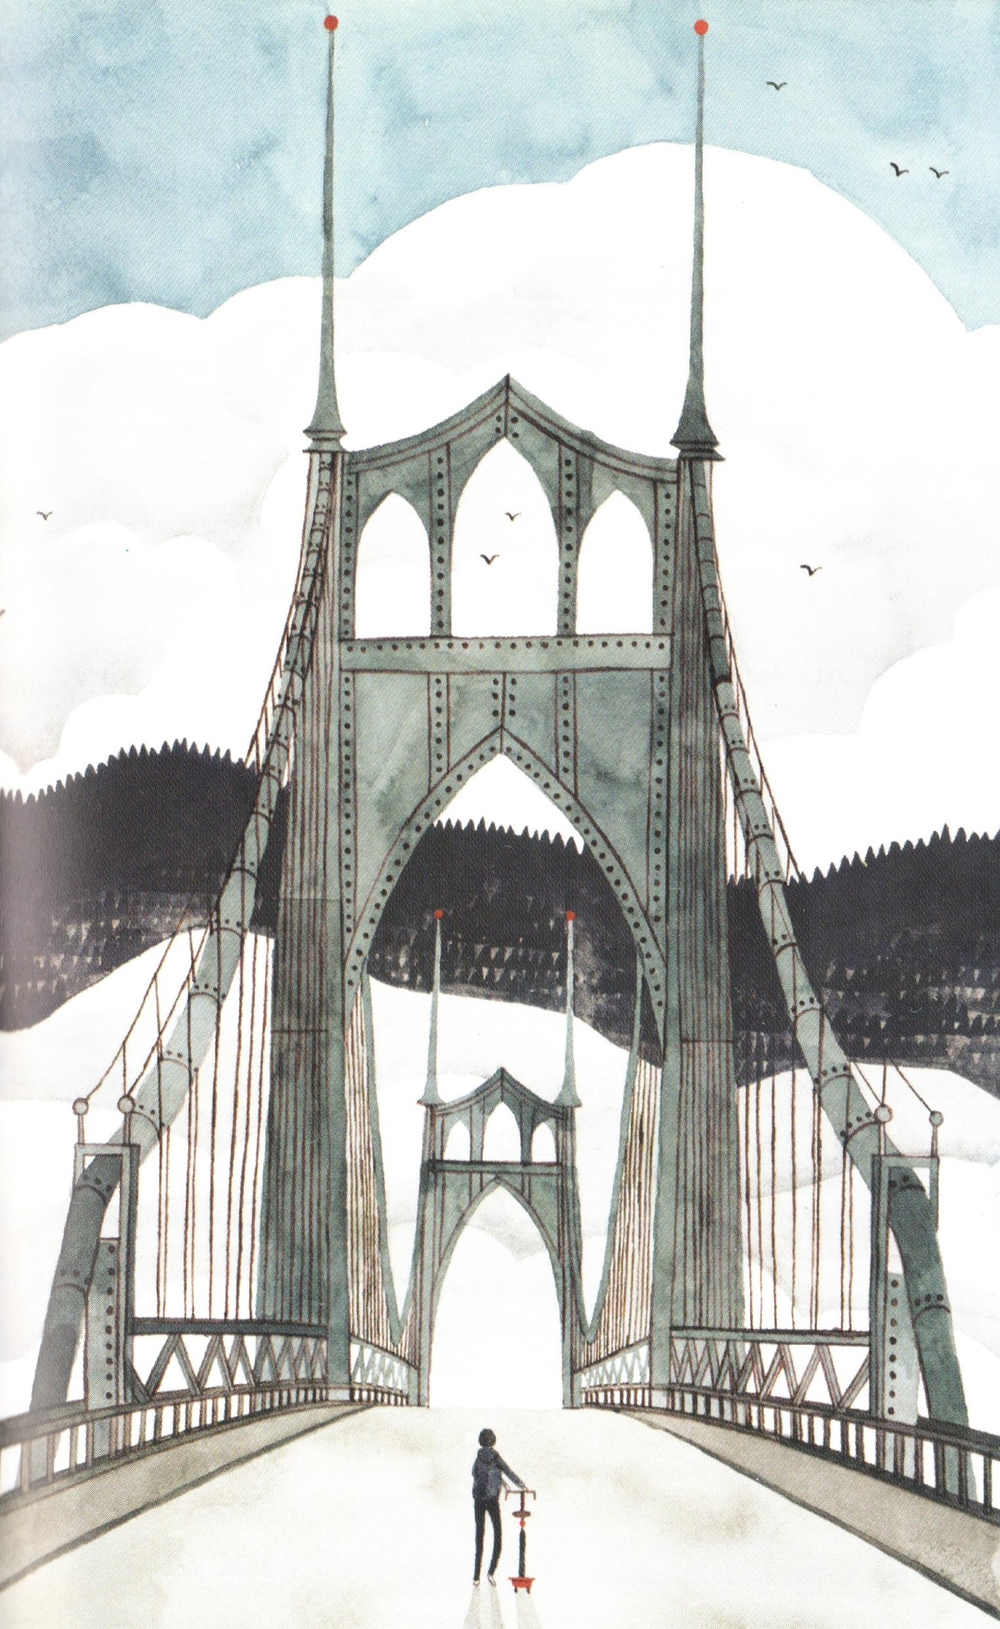 Crossing the Ghost Bridge